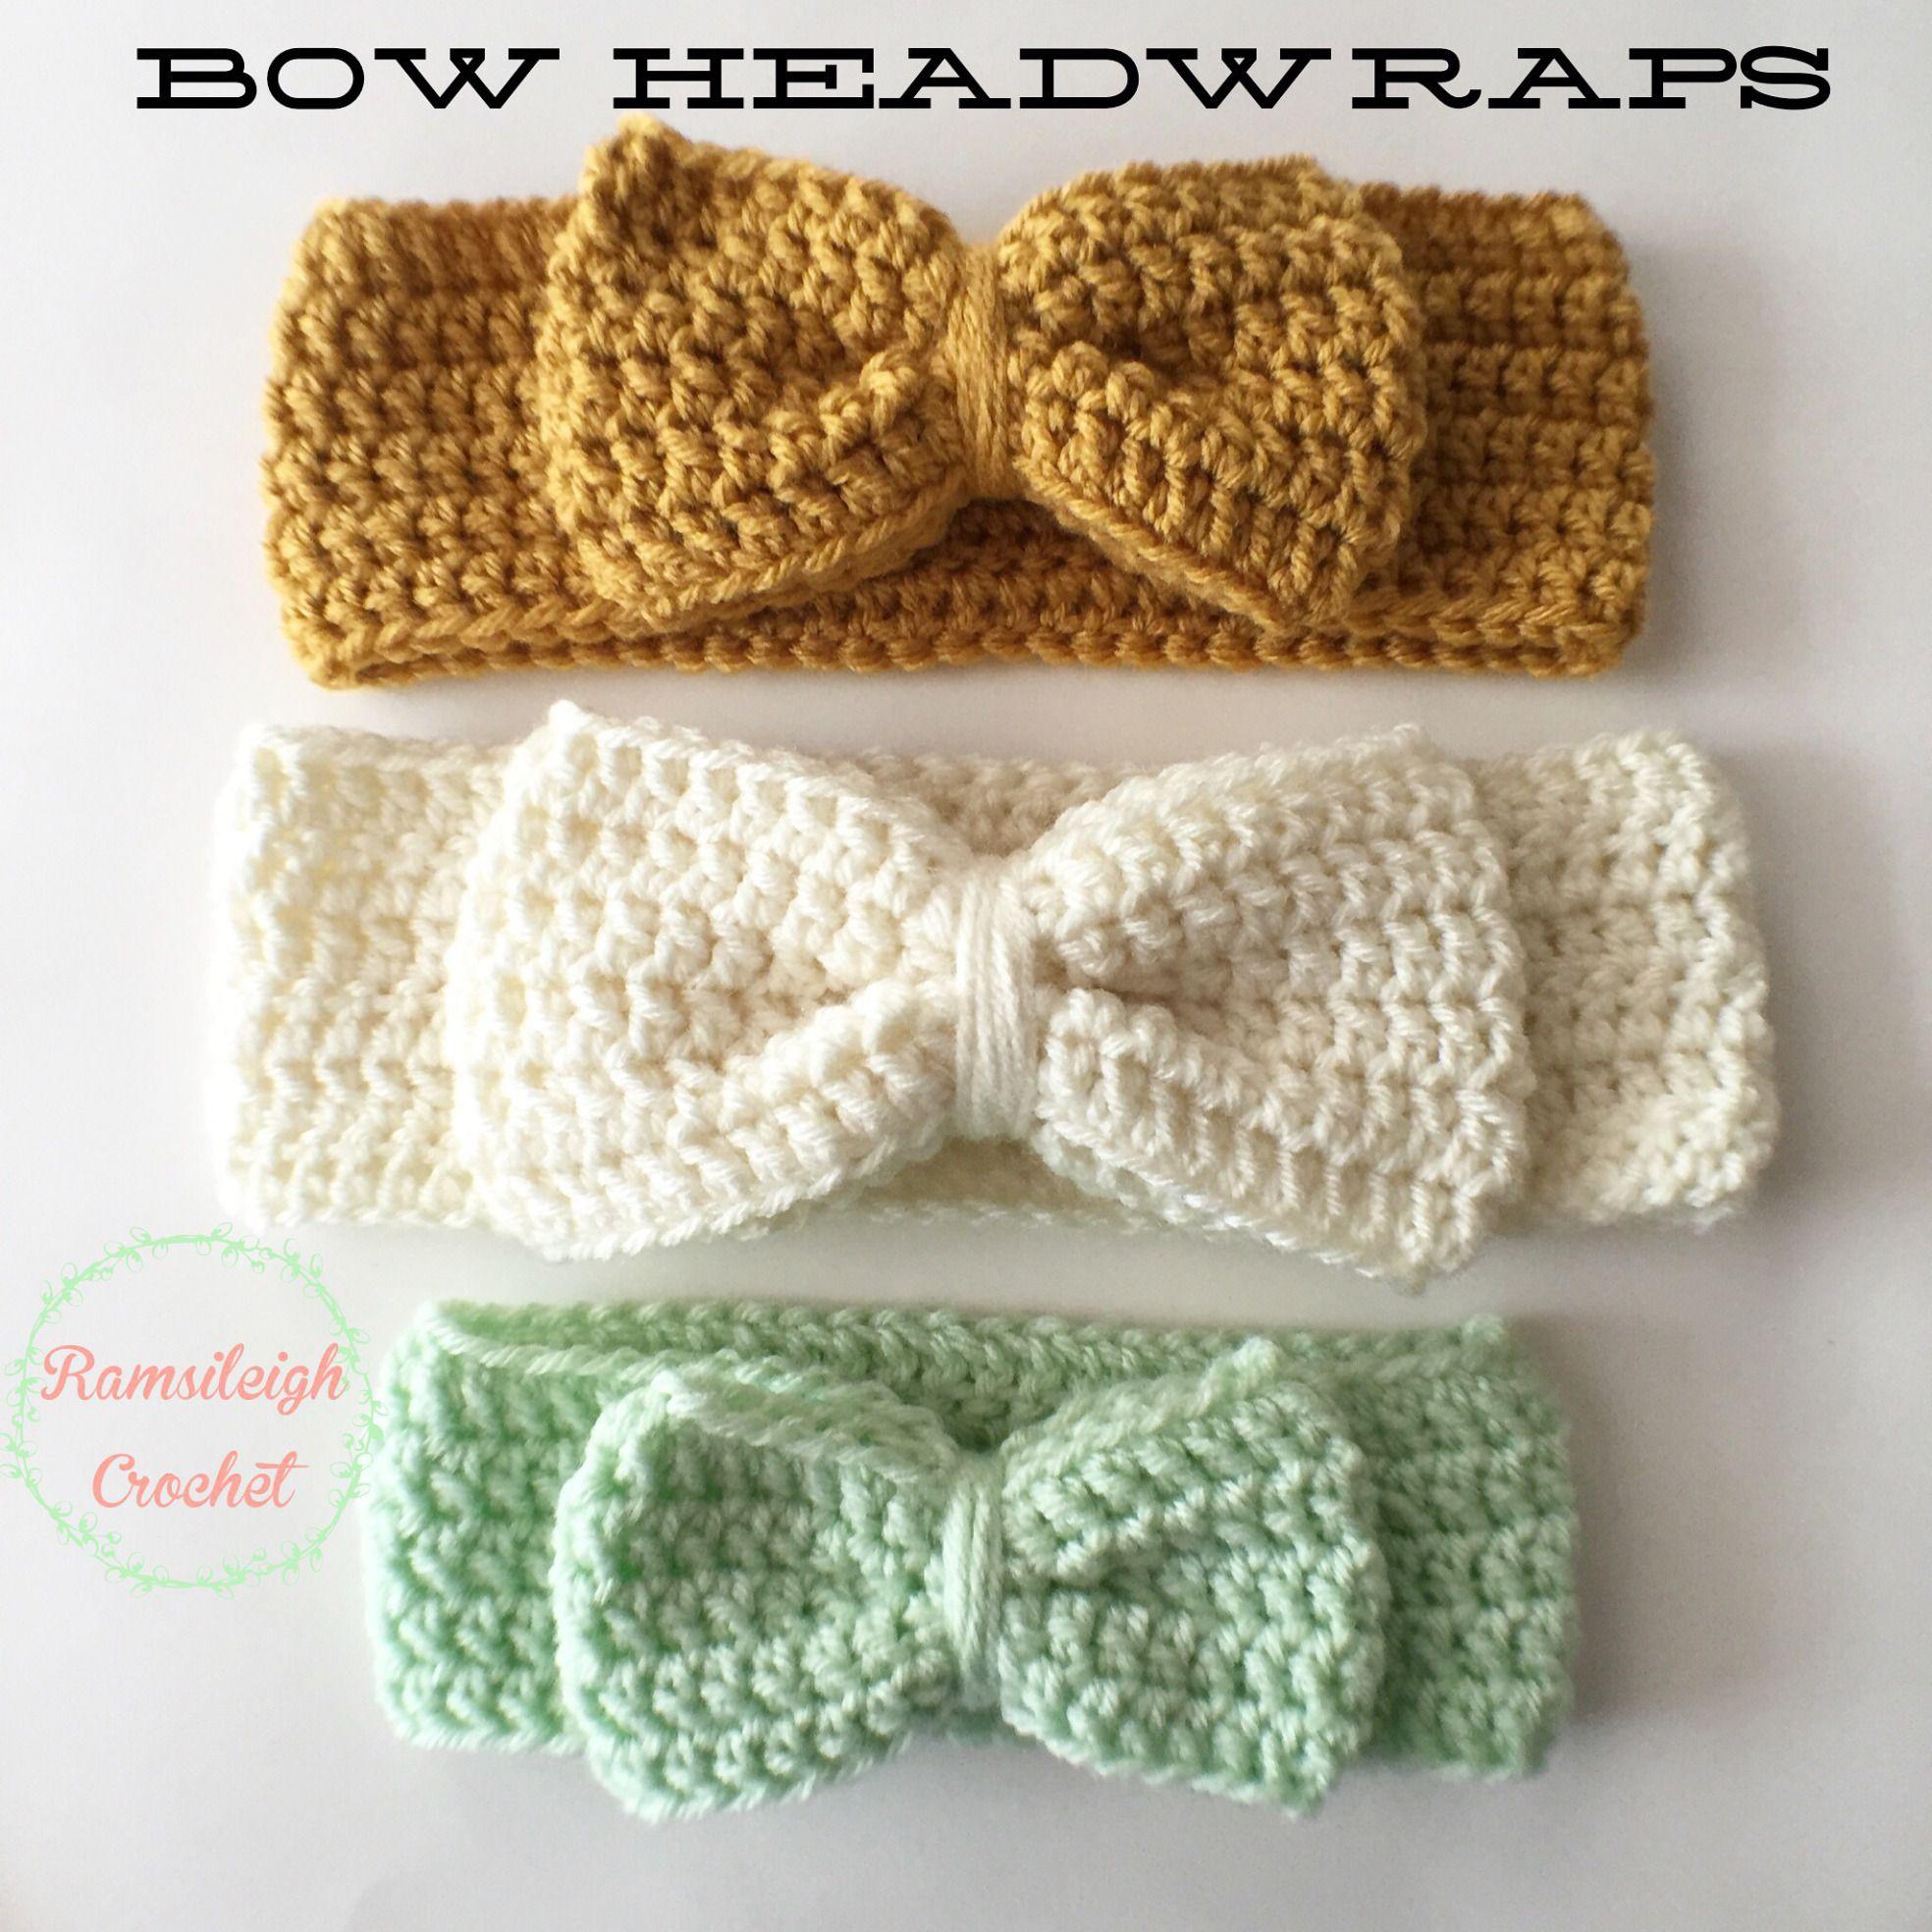 Crochet bow headwrap free pattern crotchet to do projects crochet bow headwrap free pattern bankloansurffo Choice Image